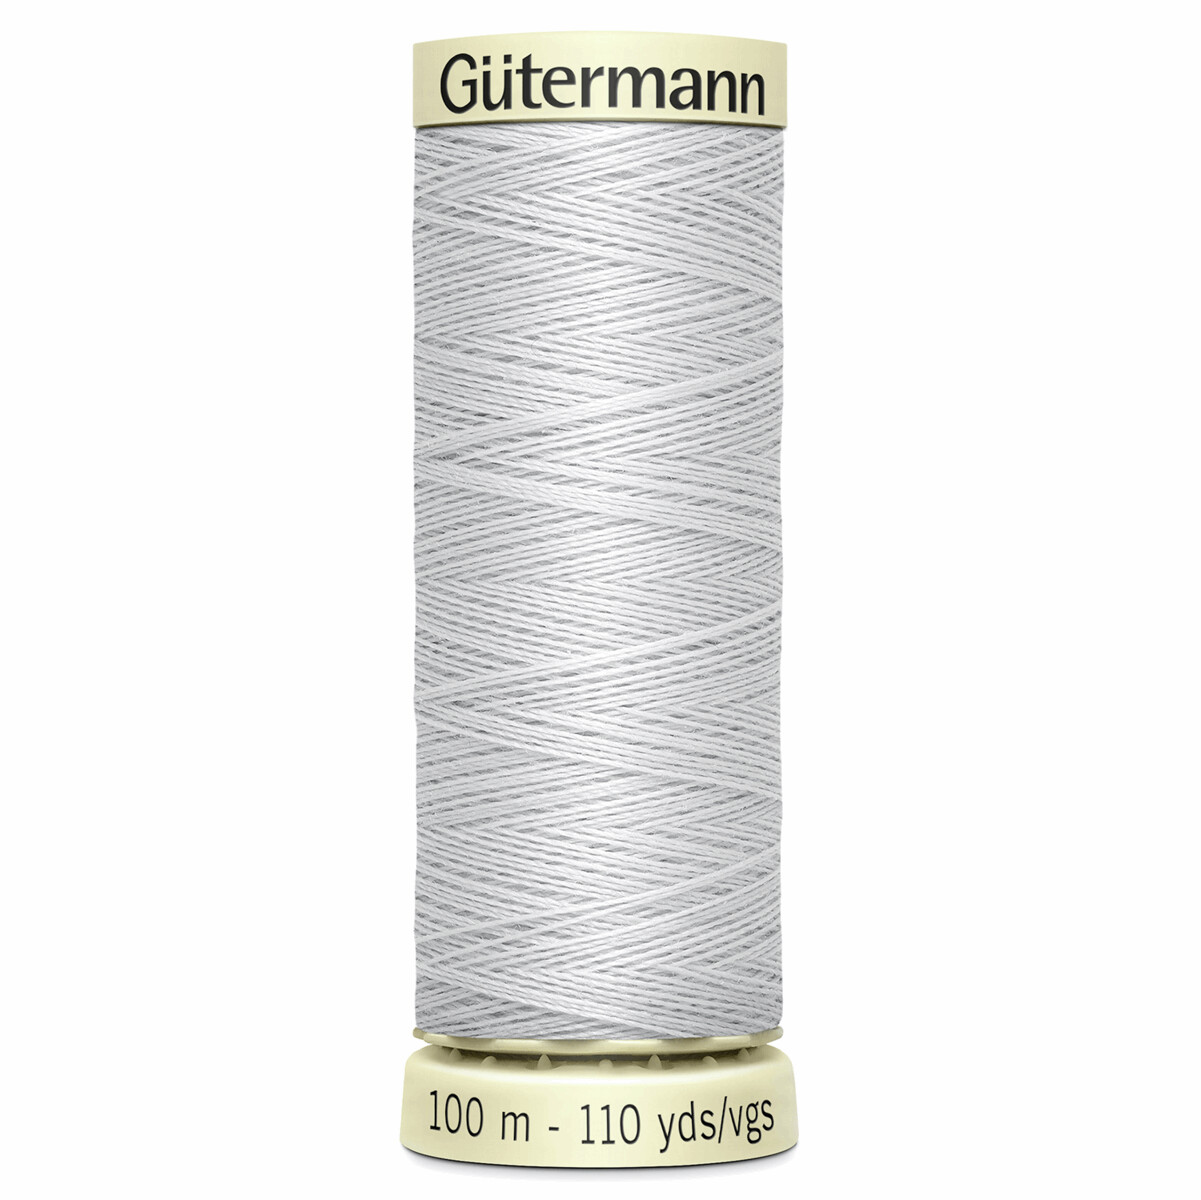 Gutermann Sew-All Thread 08